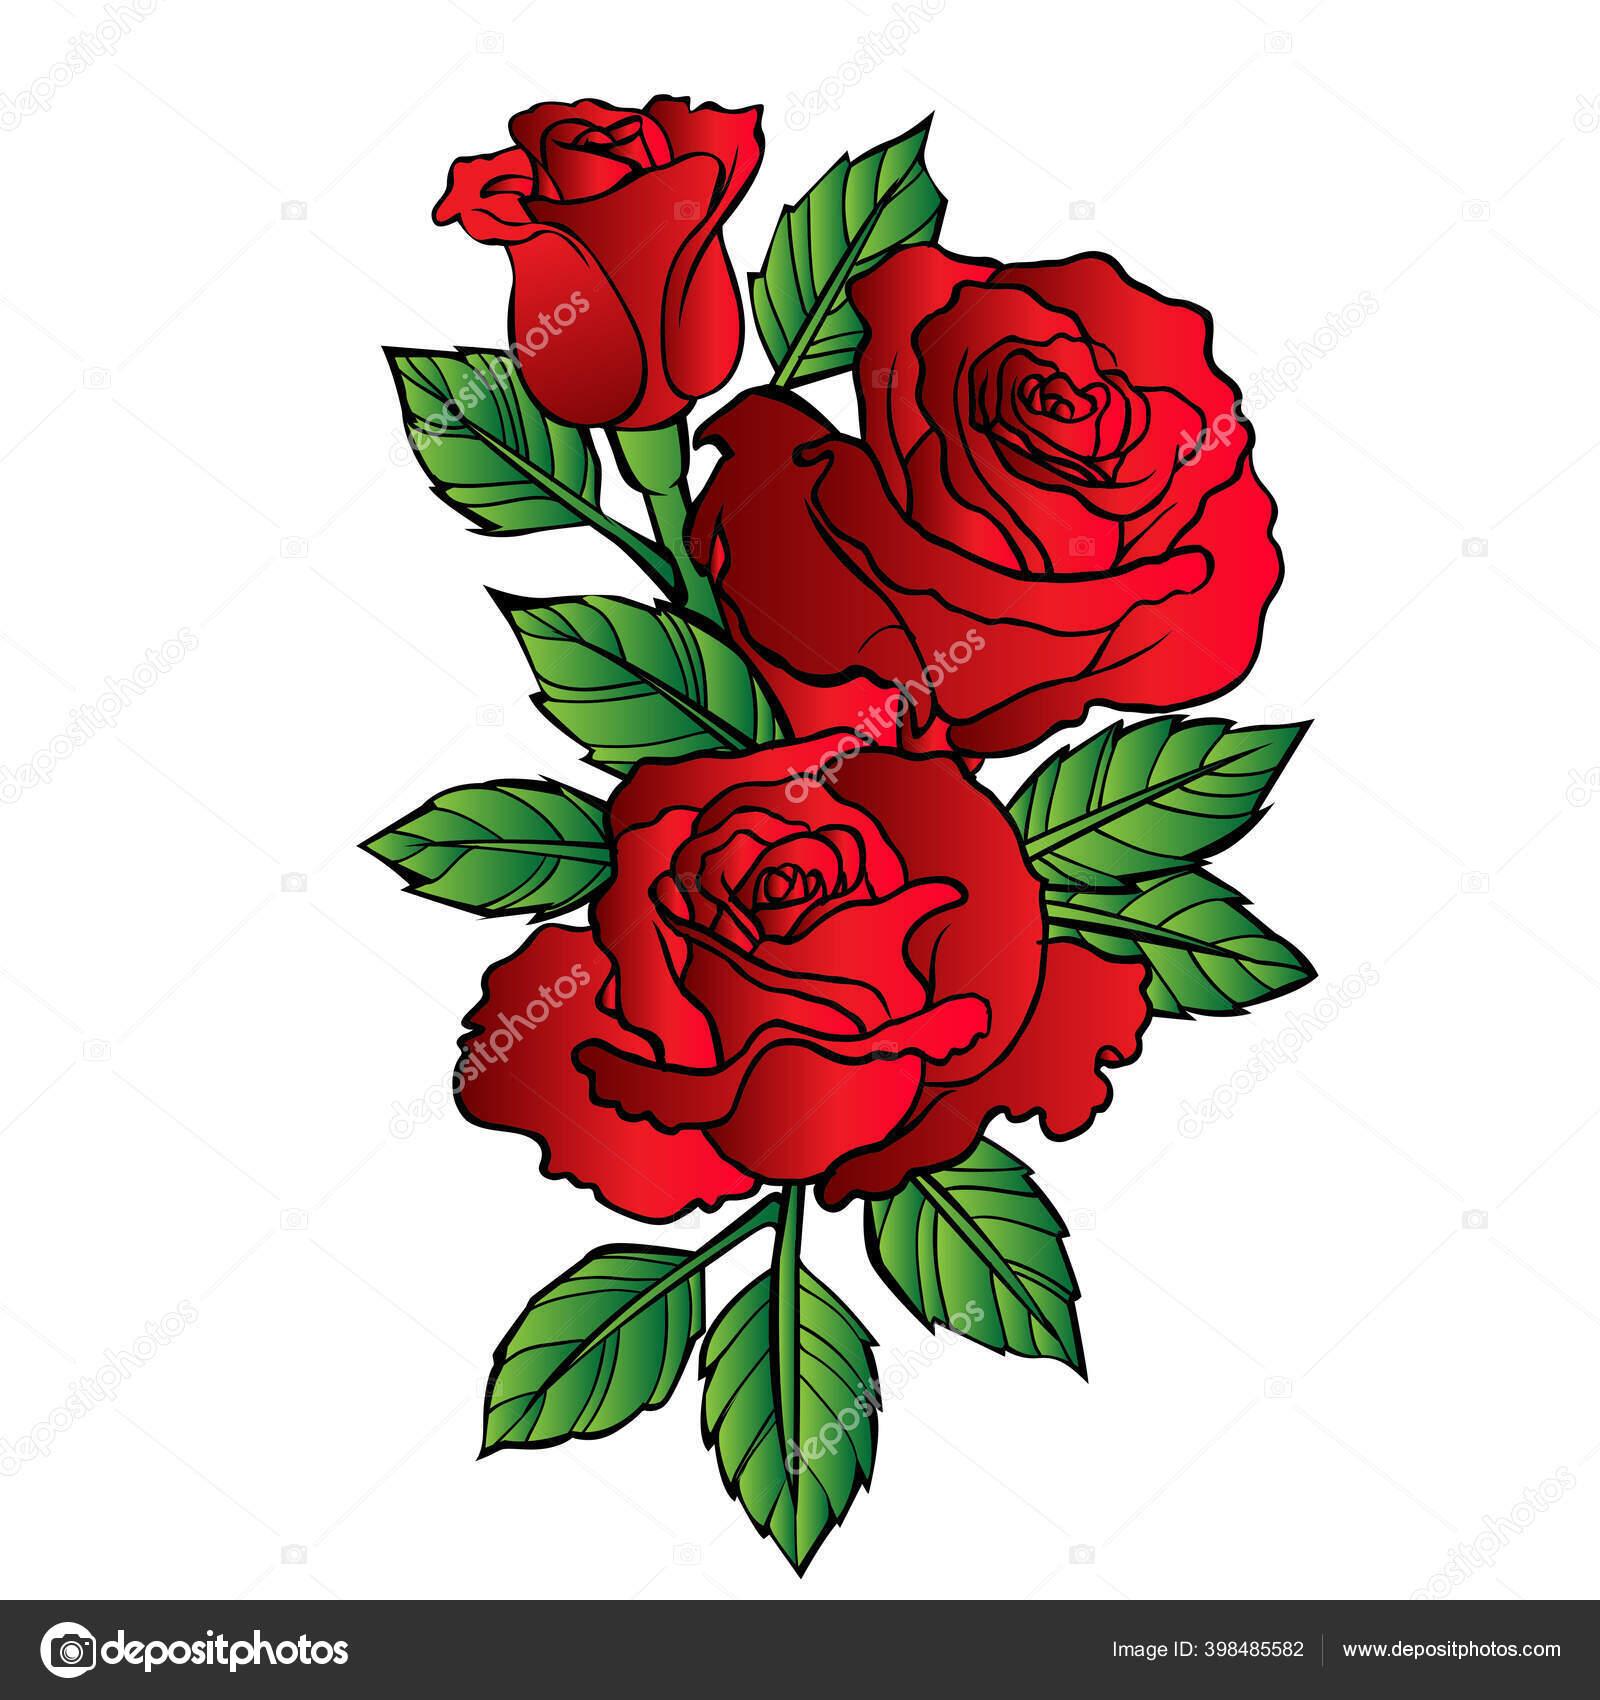 Bunga Vektor Mawar Kartun Merah Ilustrasi Stok Vektor C Thinkliketiger Gmail Com 398485582